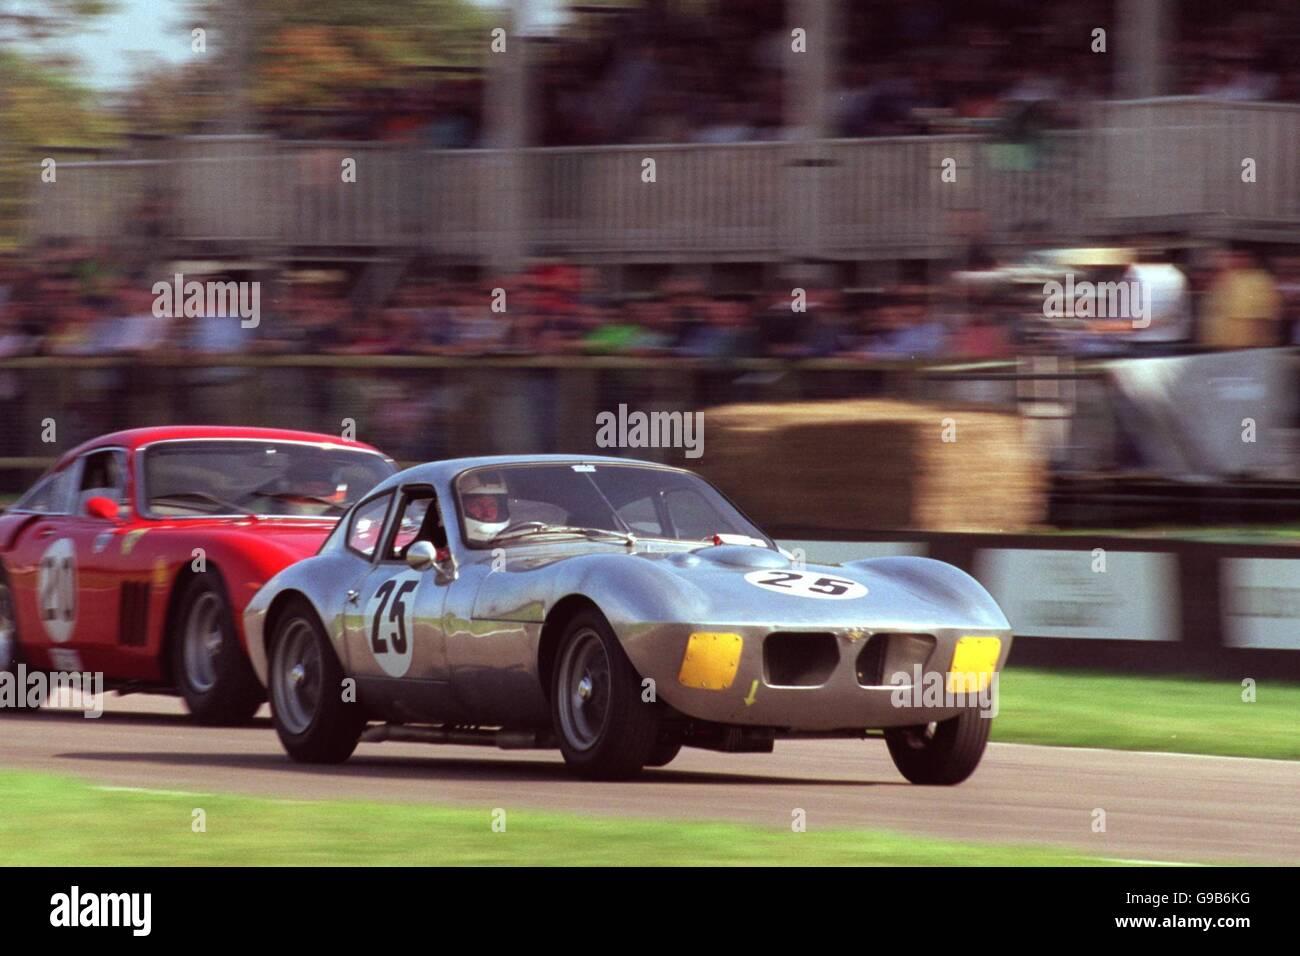 Motor Racing - Goodwood Revivalist Meeting - The RAC TT Celebration Stock Photo